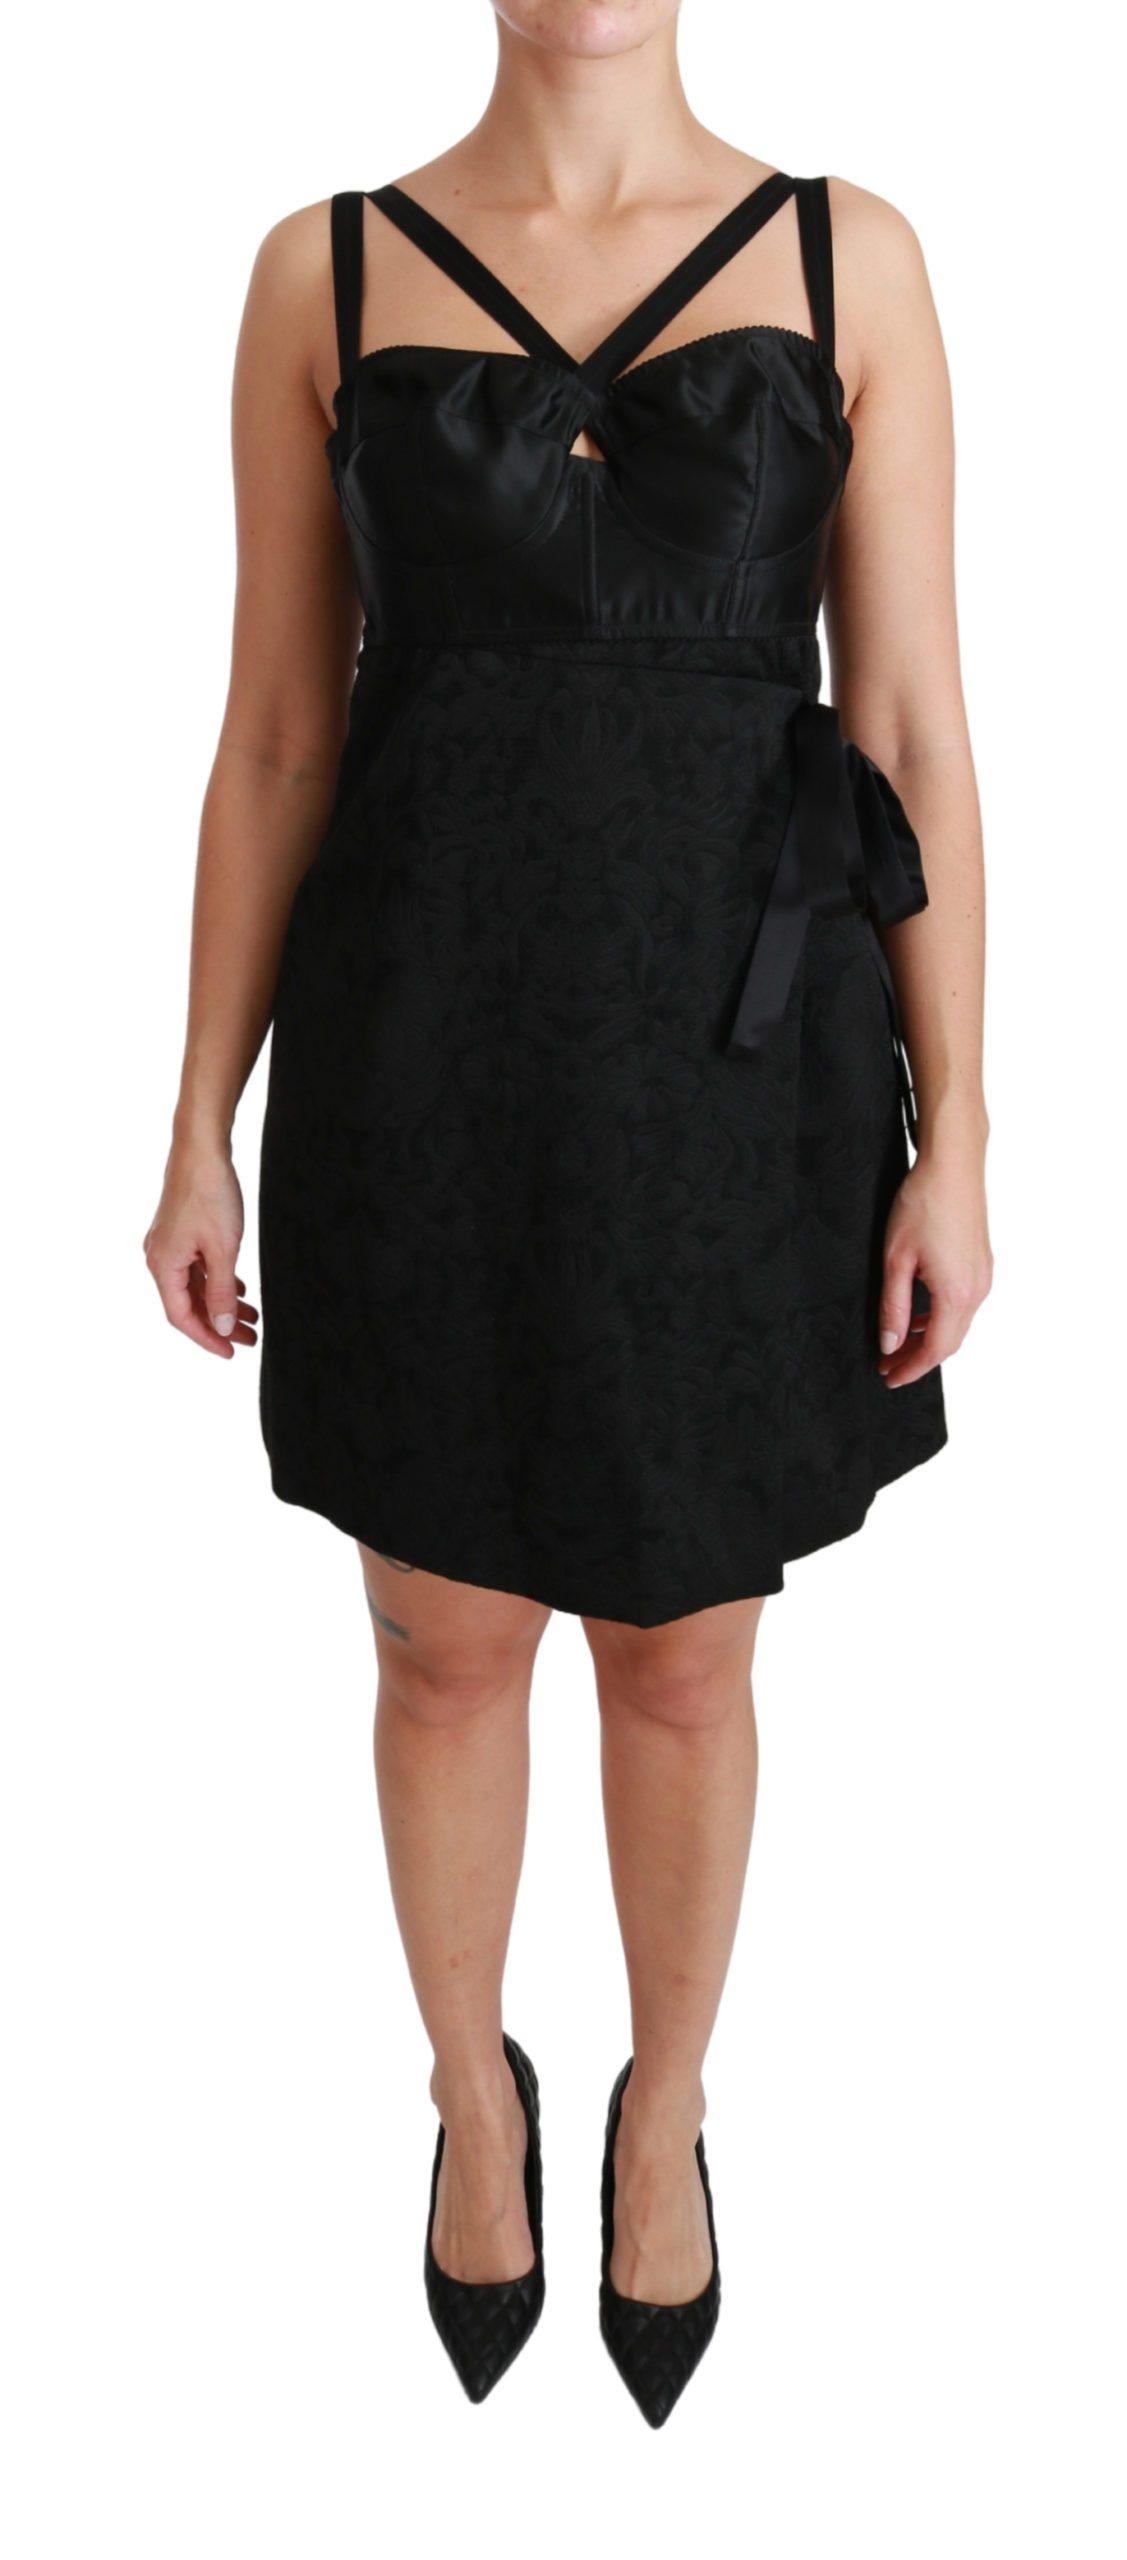 Dolce & Gabbana Women's Stretch Satin Jacquard Mini Dress Black DR2497 - IT44 L